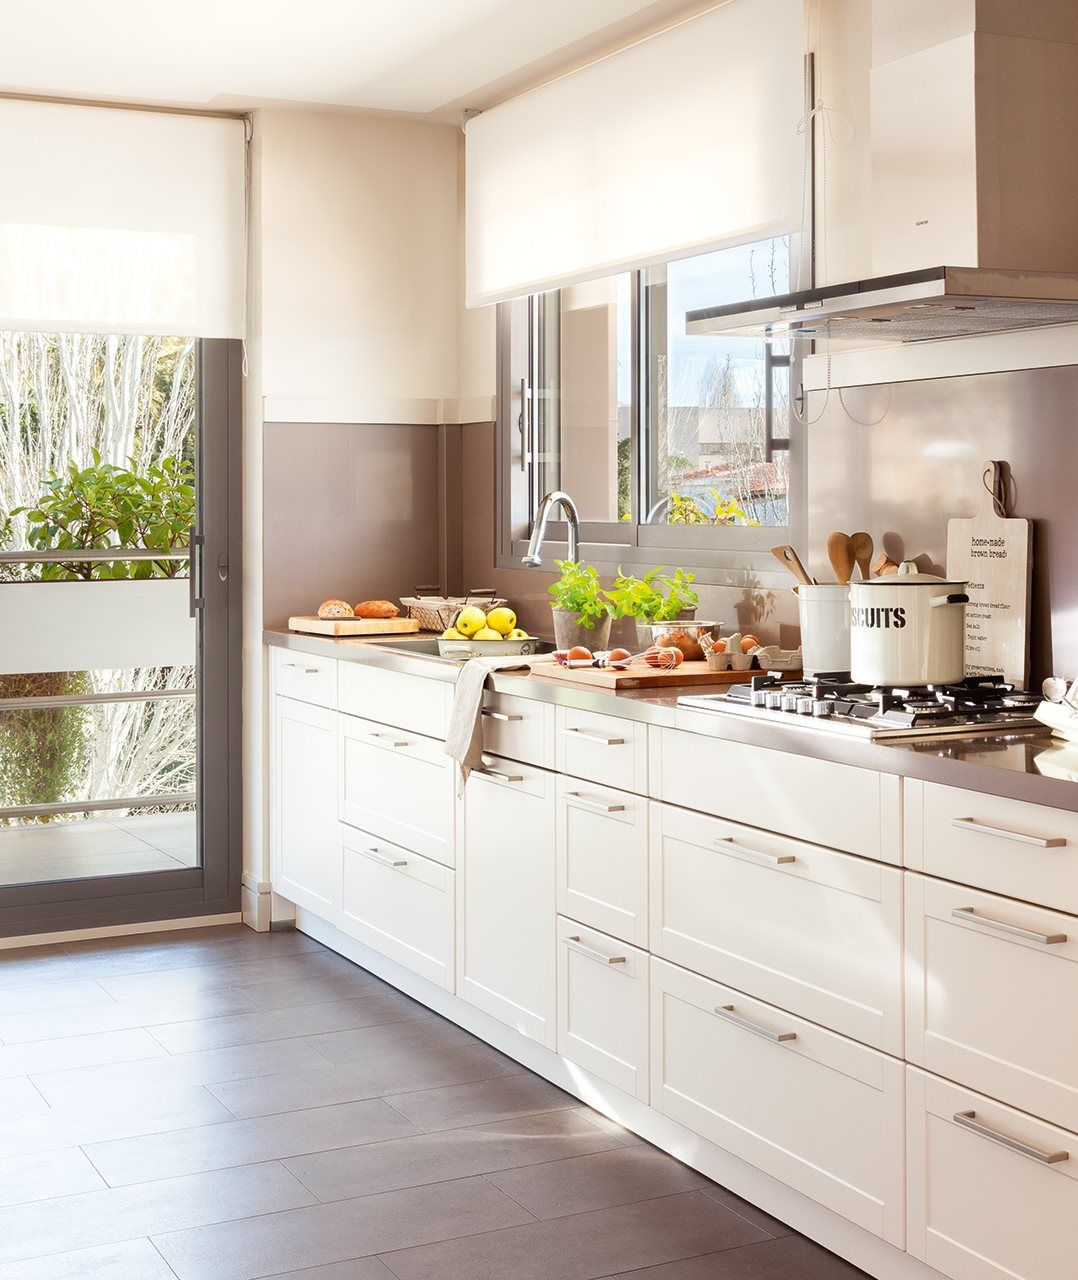 11 consejos básicos para cocinas | Kitchens, Ideas para and House